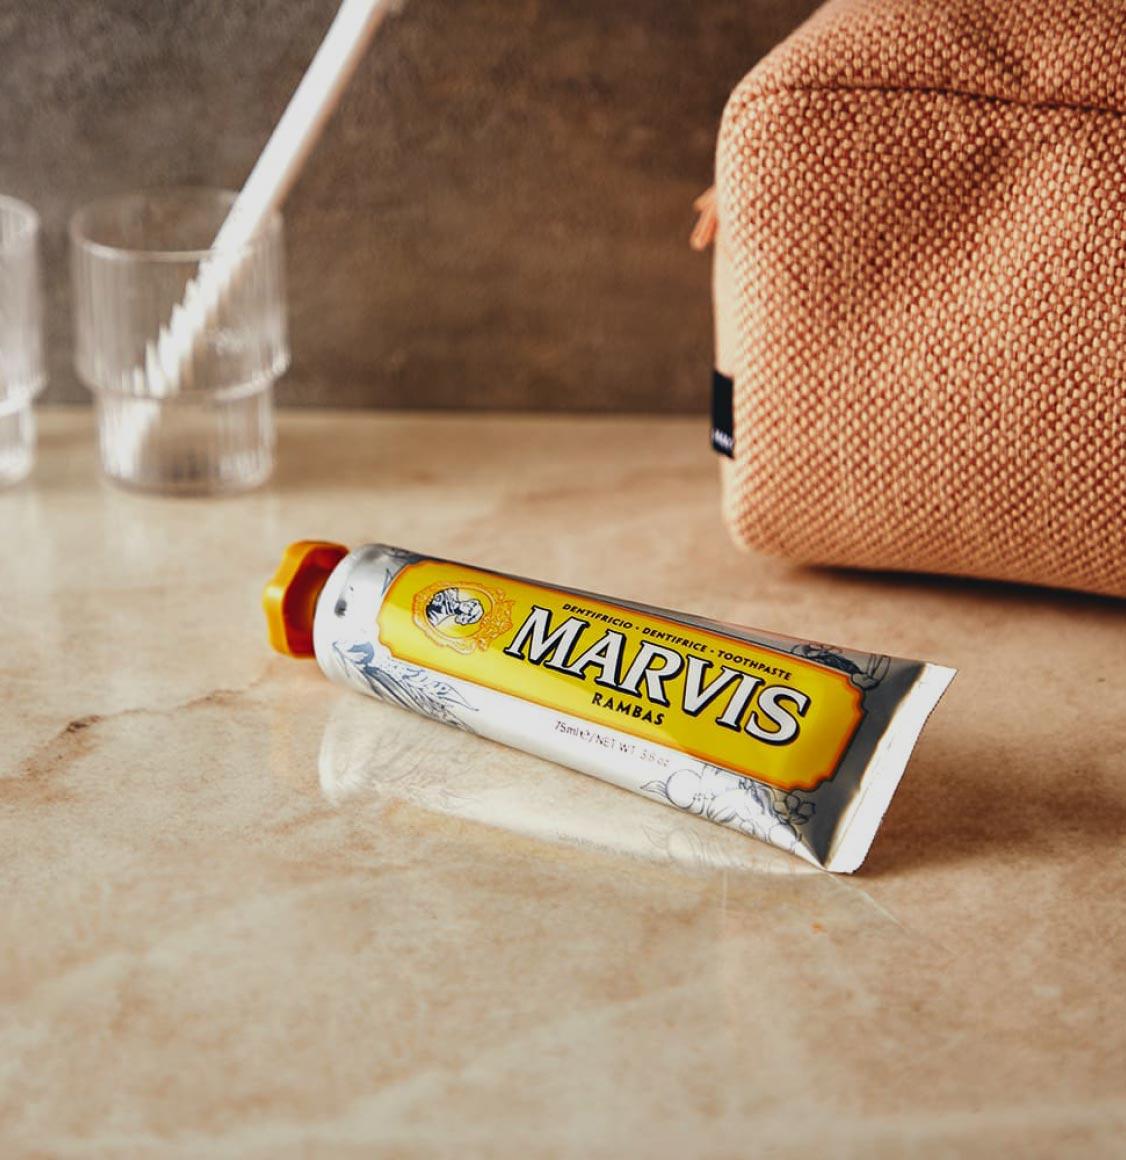 Marvis Rambas Limited Edition Toothpaste 75ml